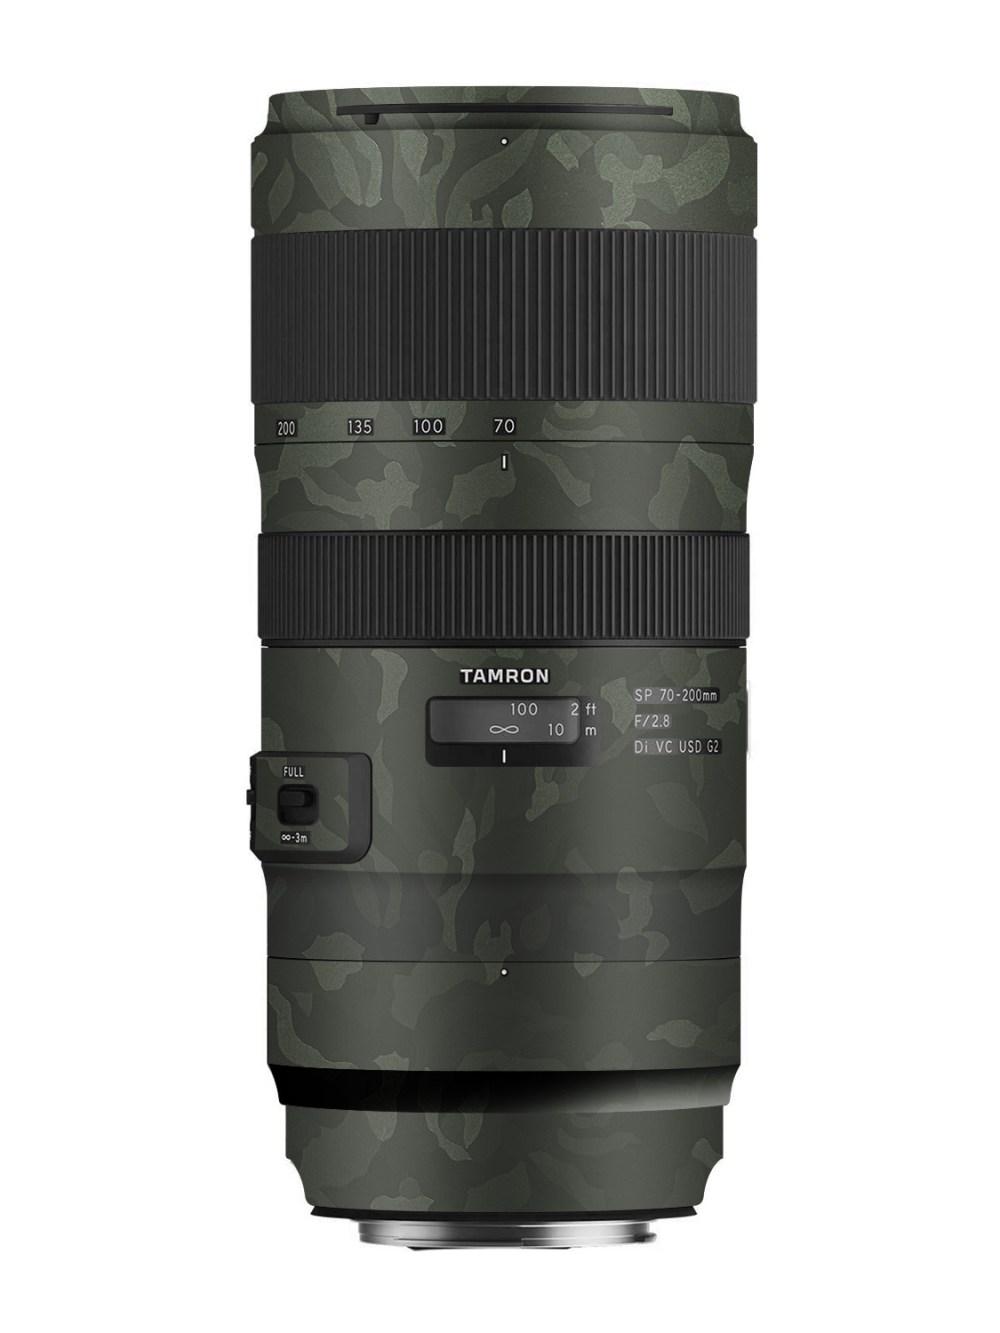 Tamron SP 70-200 F2.8 Lens Skin Wrap